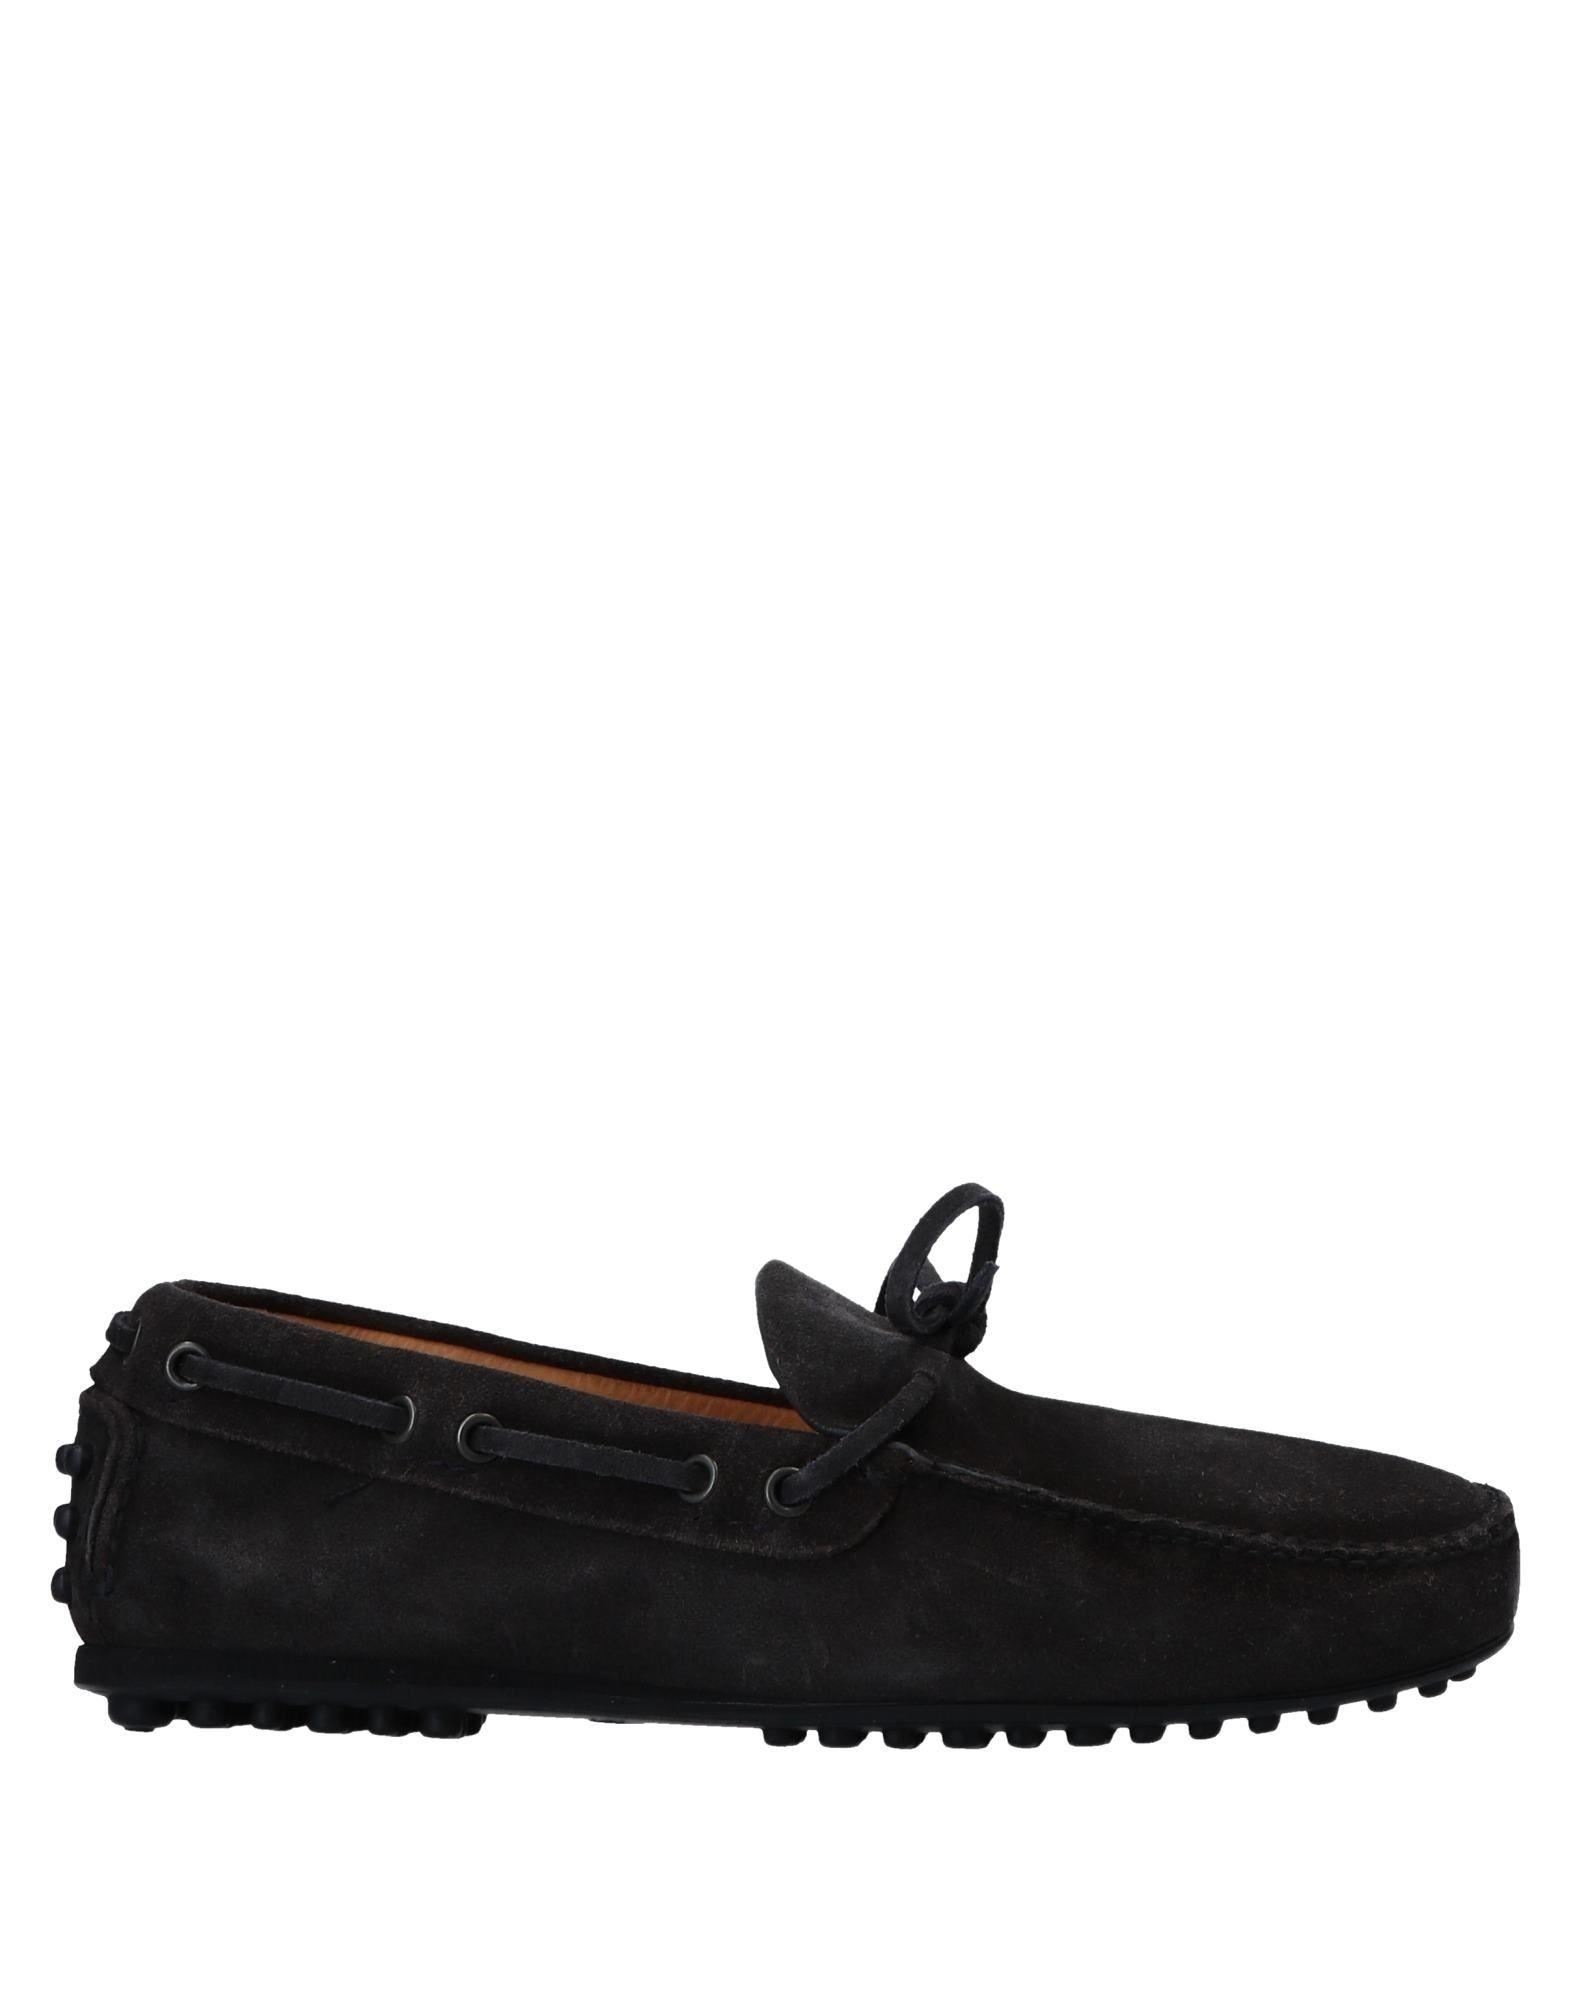 Carshoe Mokassins Herren  11167813FO Gute Qualität beliebte Schuhe